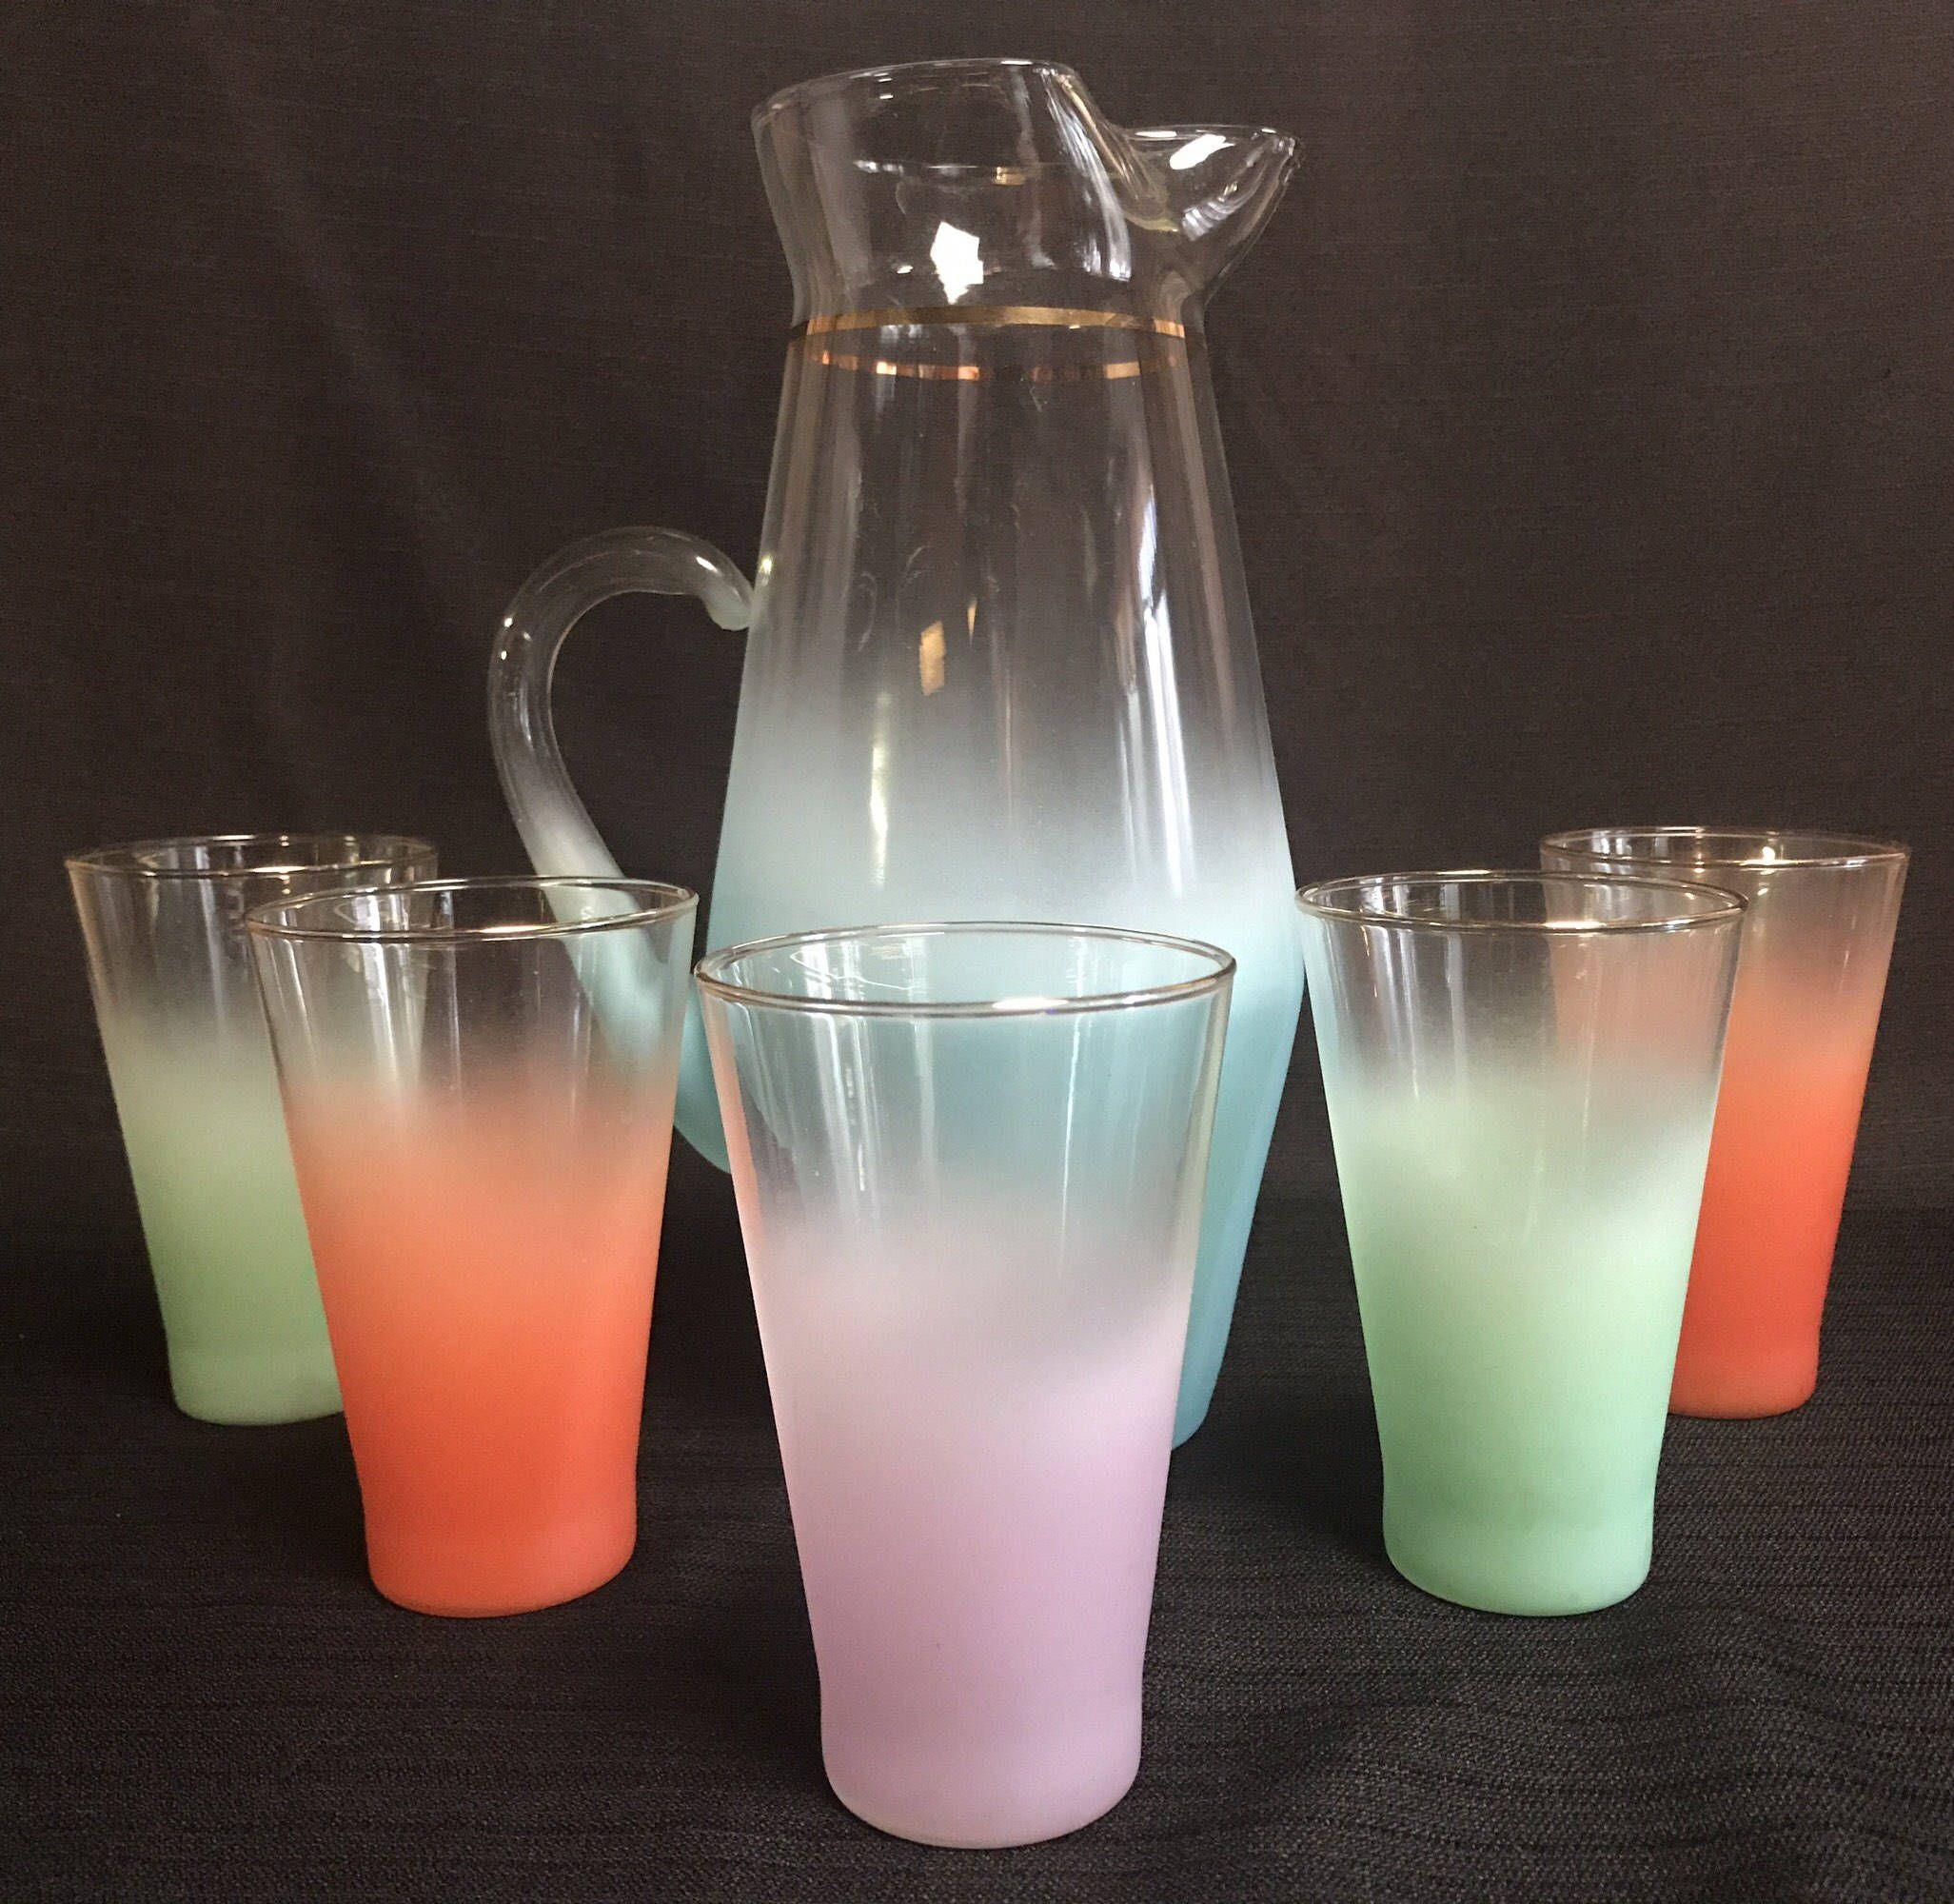 blendo frosted multi colored pitcher set barwaredrinkware mad  - blendo frosted multi colored pitcher set barwaredrinkware mad mencocktaillemonade retro glassbar ware modern nostalgia